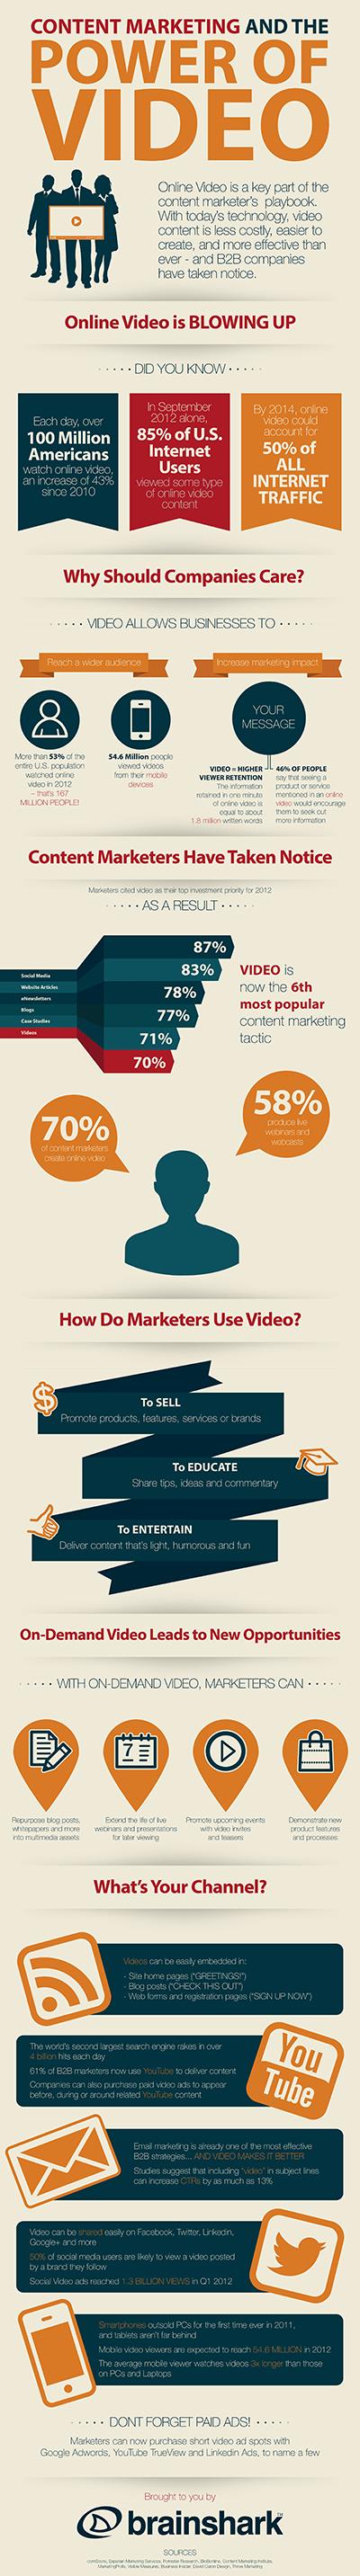 video blogging industry online video essay